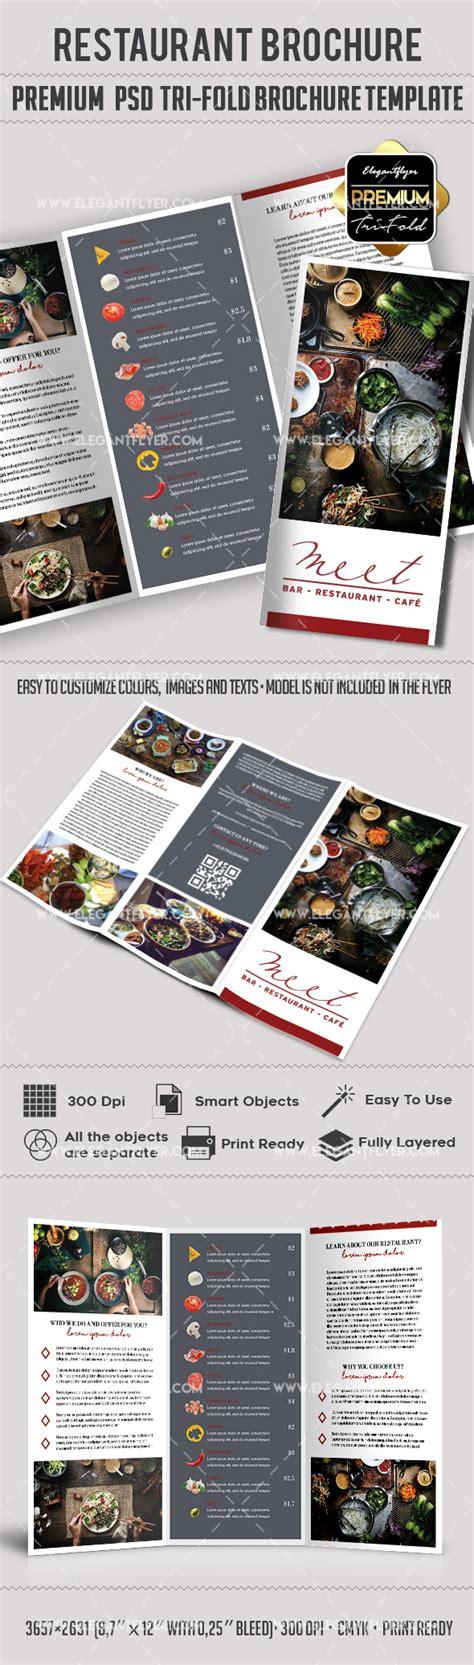 Template Brochure For Restaurant By Elegantflyer Restaurant Premium Tri Fold Psd Brochure Template By